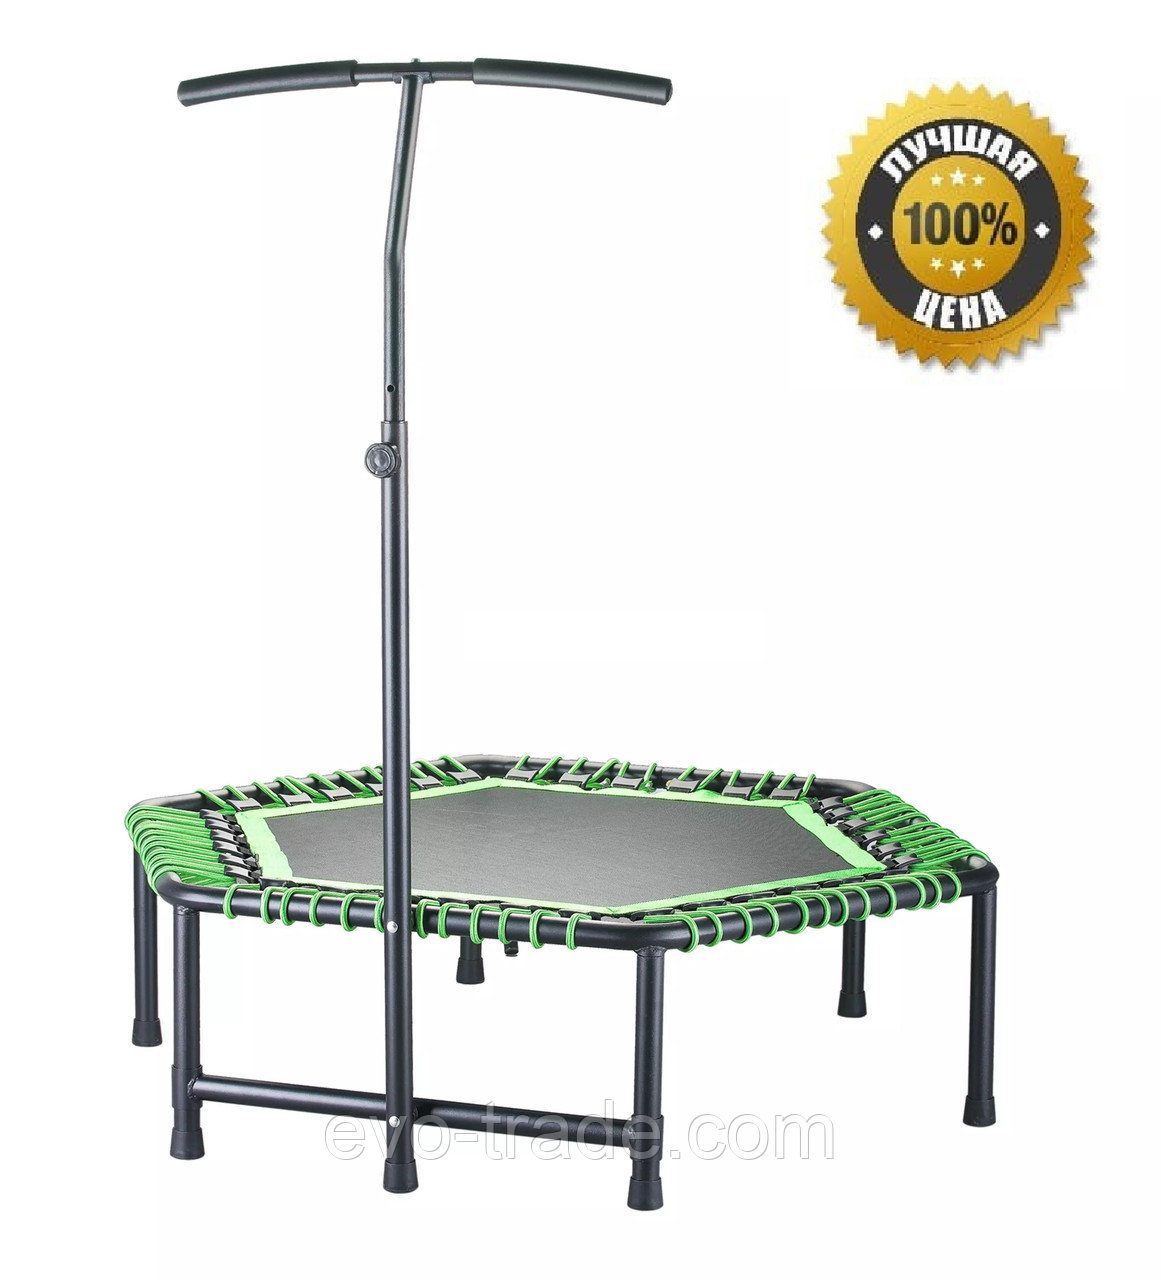 Фитнес батут Get Jump Green с нагрузкой до 120 кг